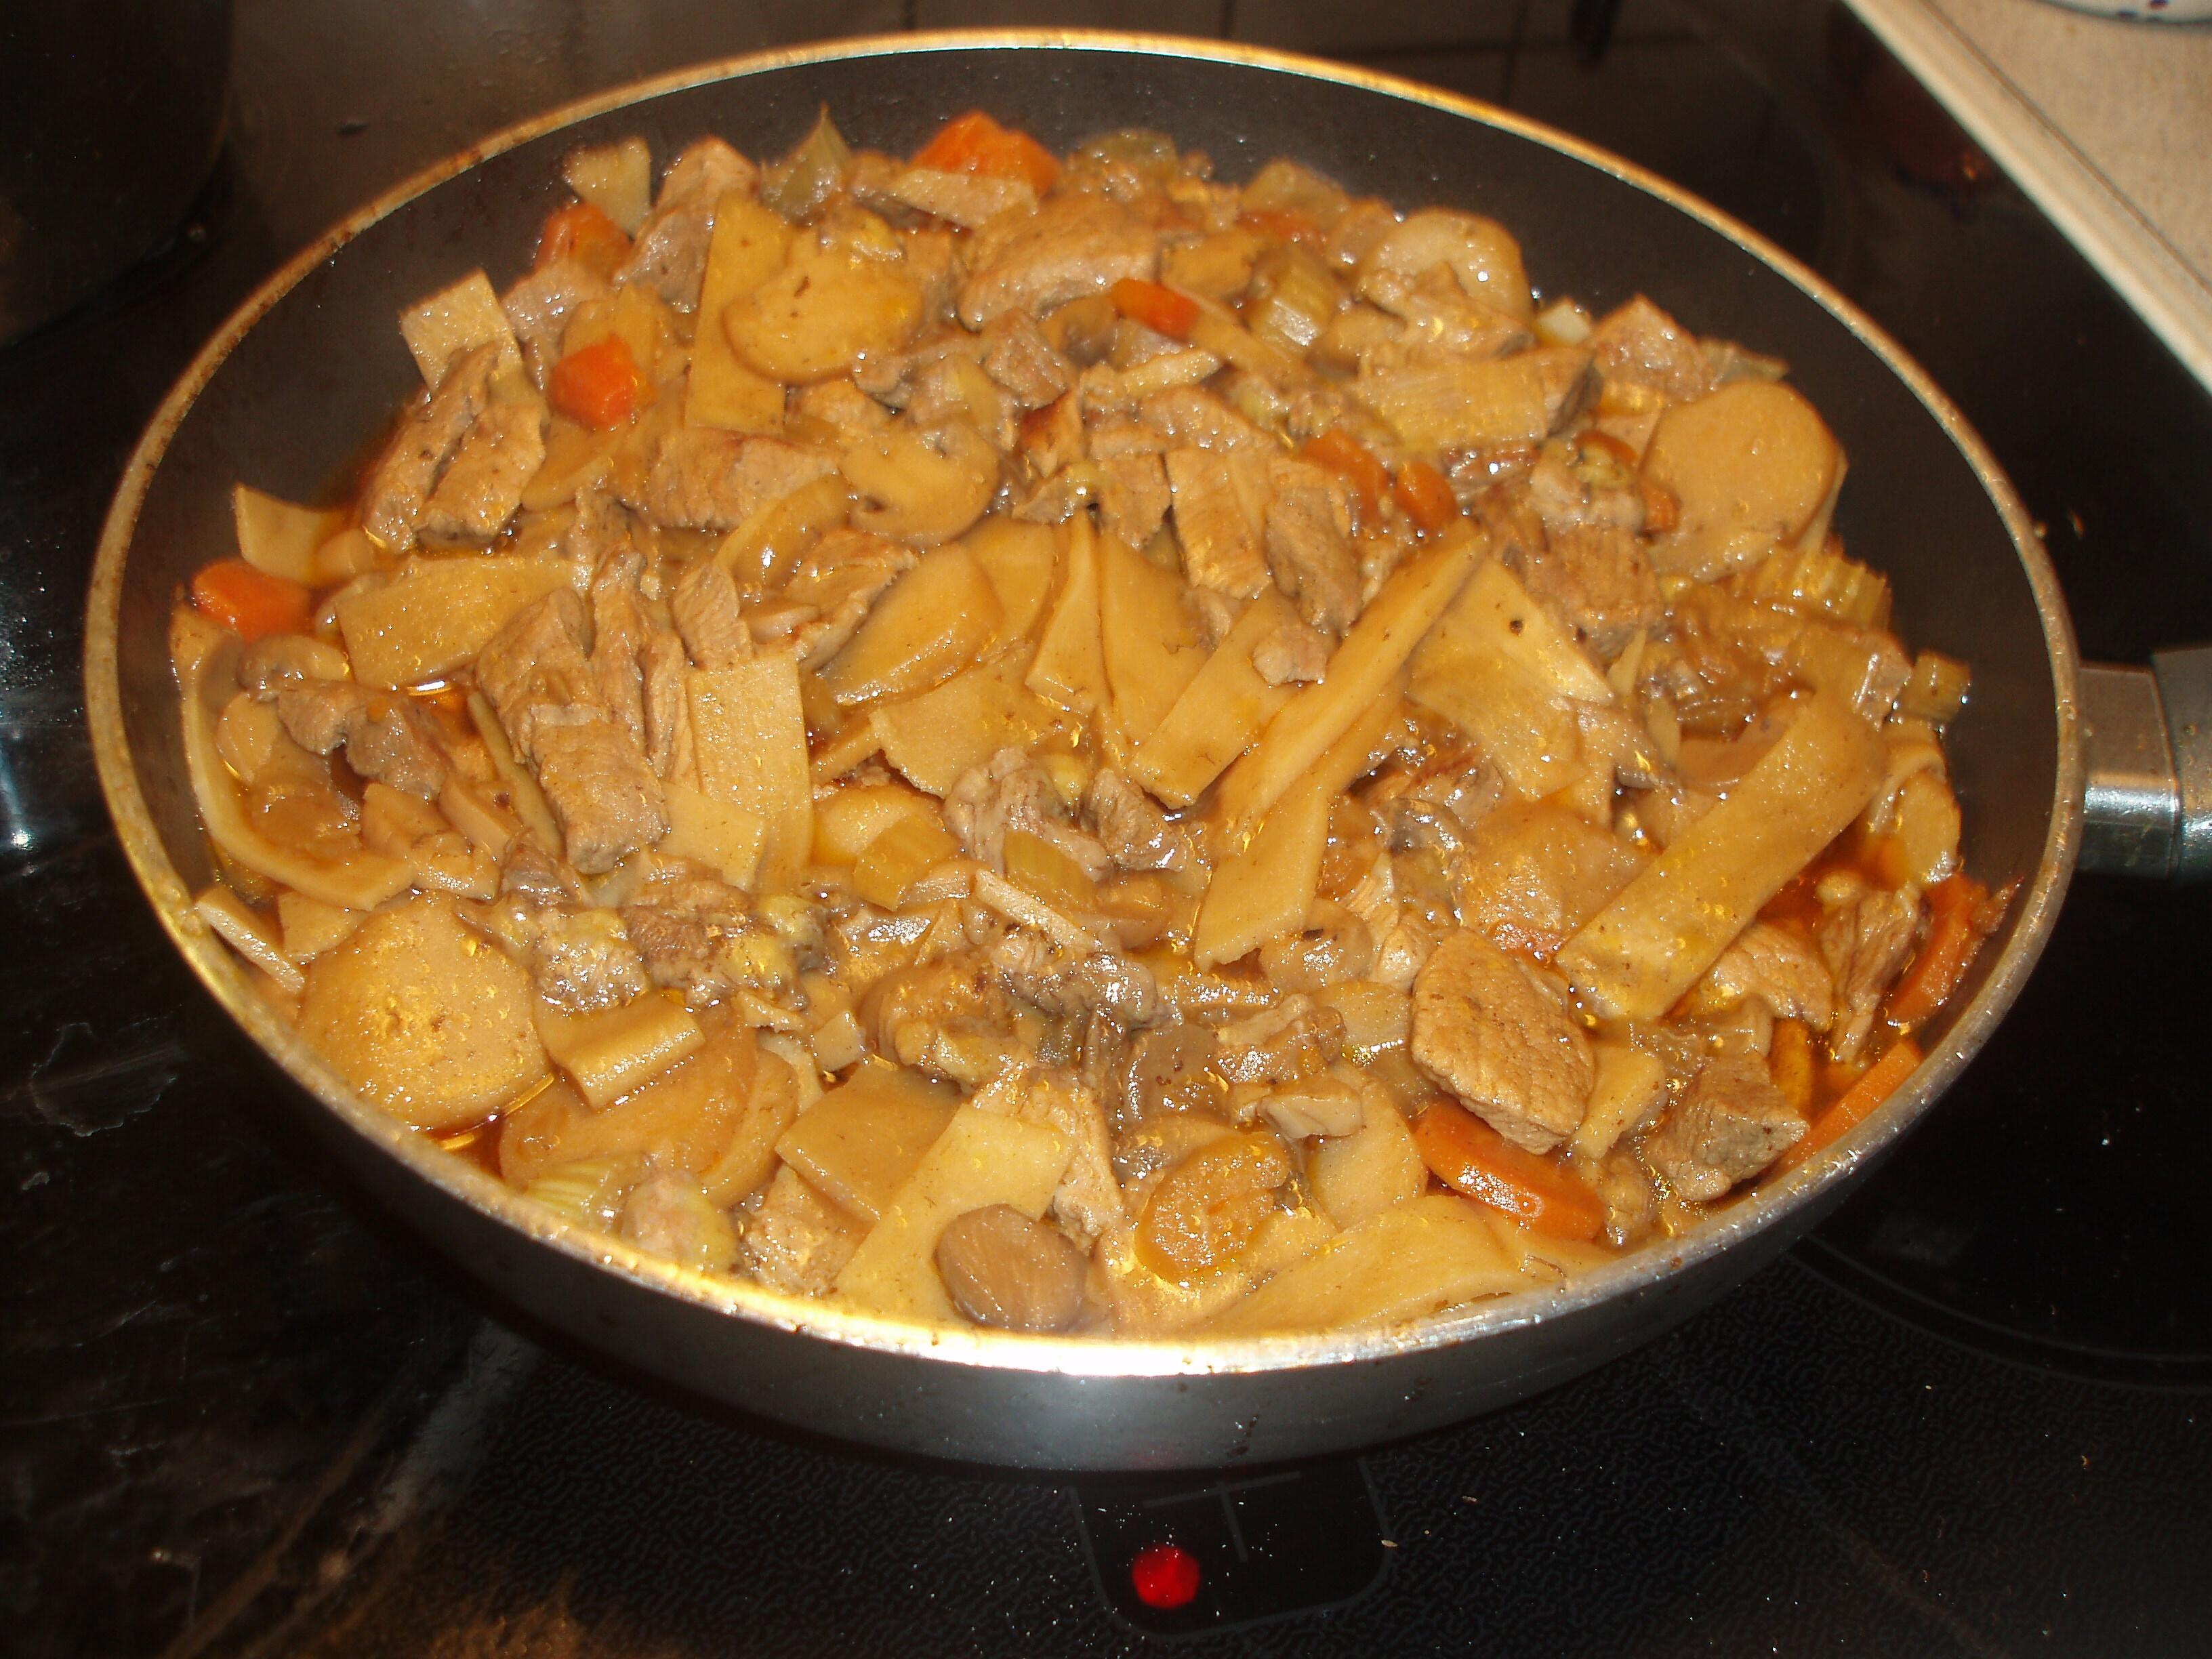 orientalisk köttgryta